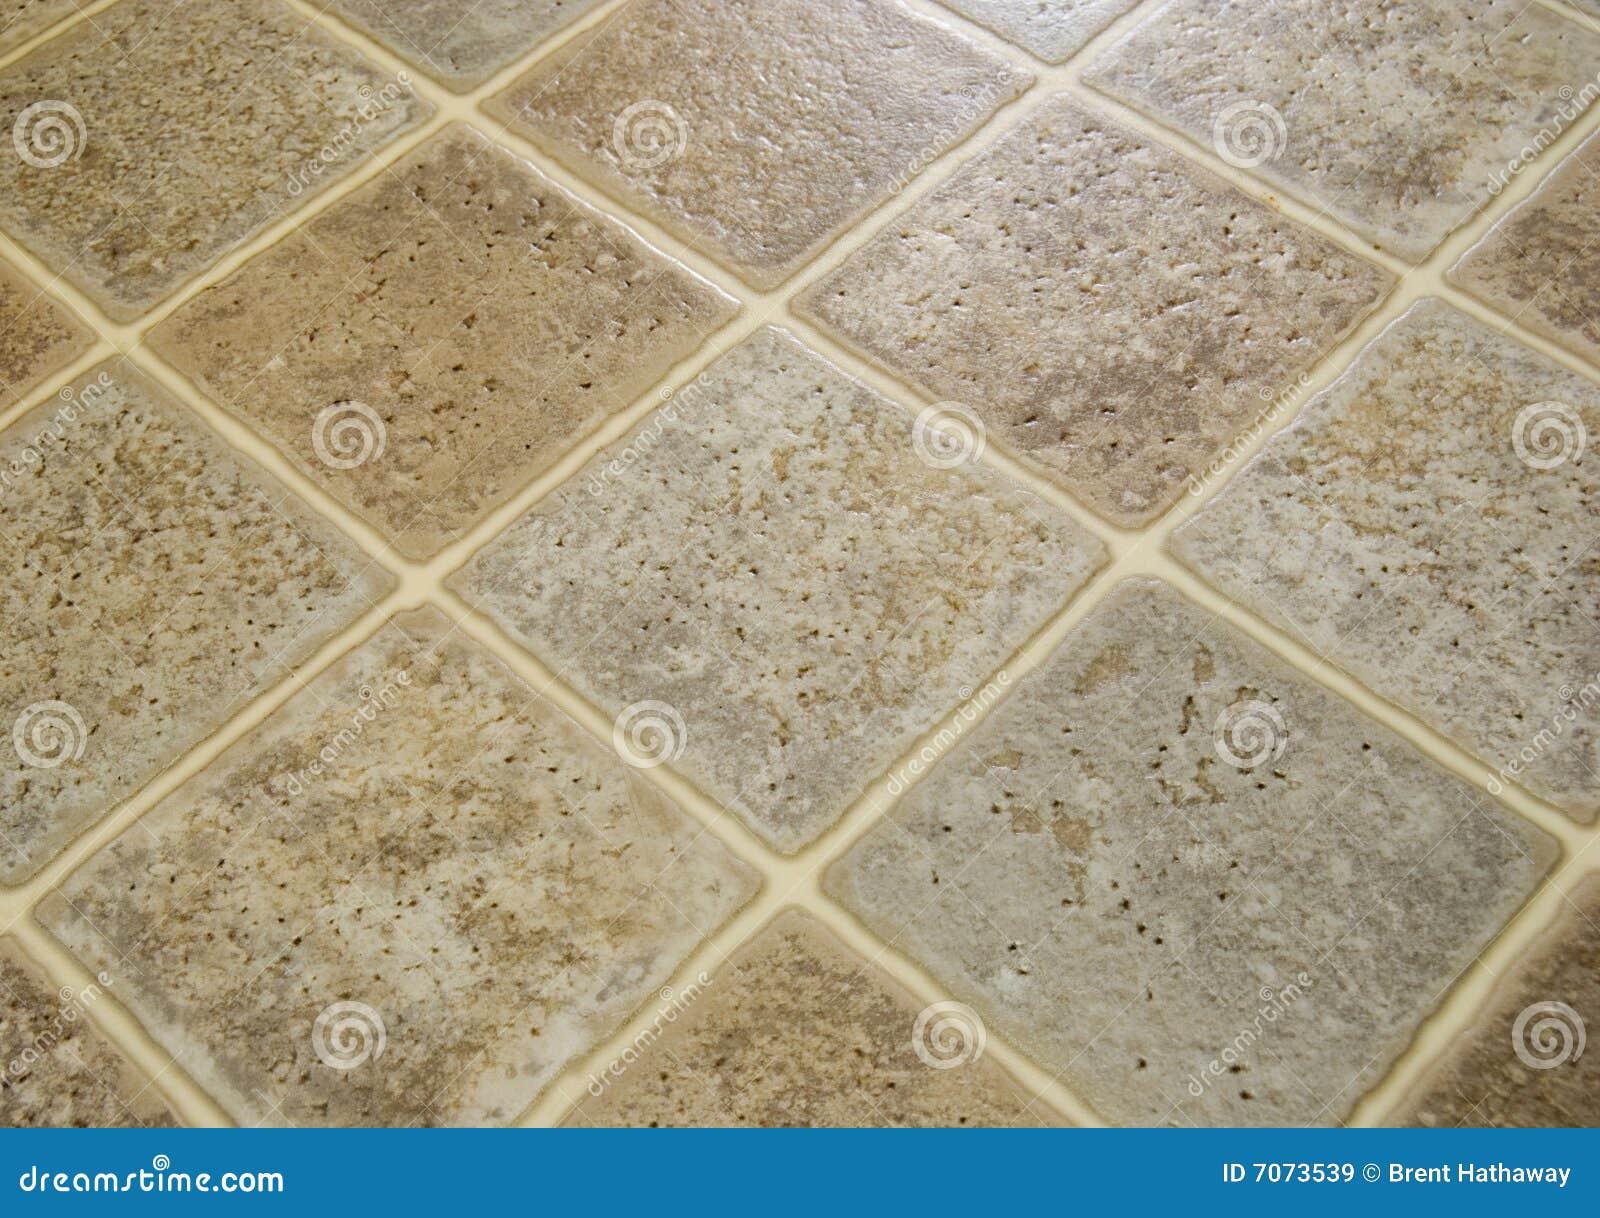 Tile floor stock image image of floor flooring pattern 7073539 tile floor dailygadgetfo Images